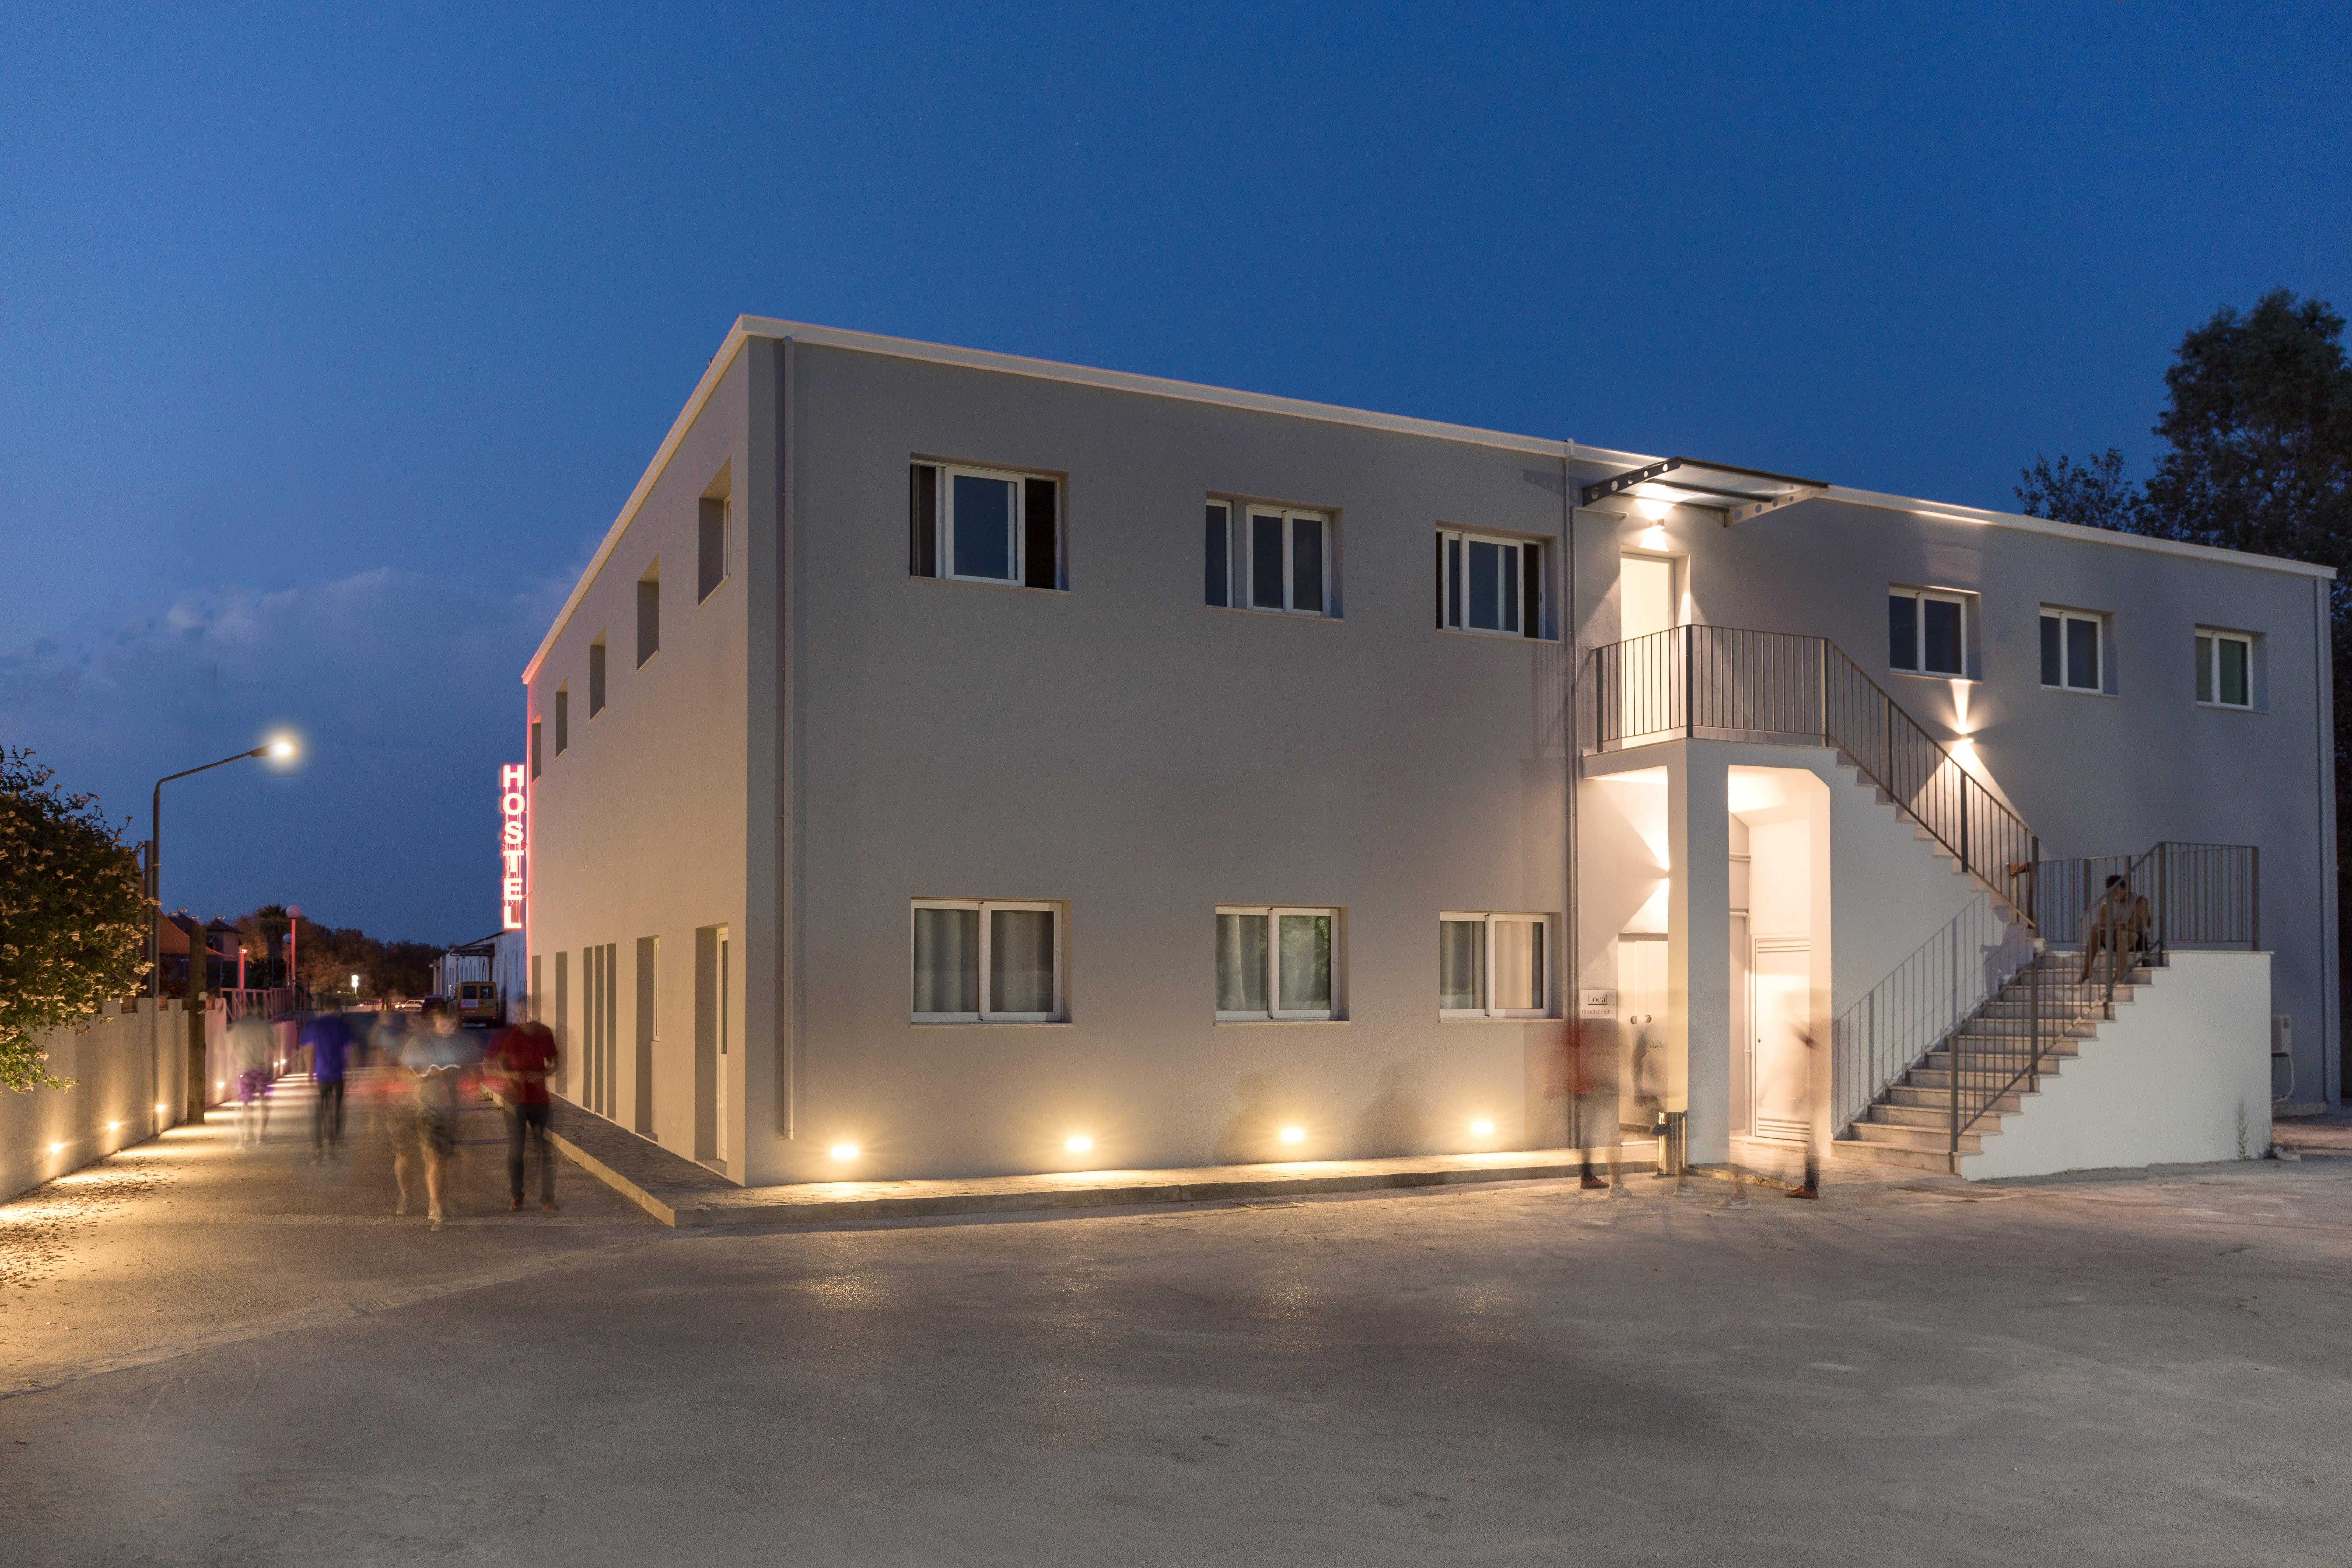 HOSTEL - Local Hostel and Suites Corfu